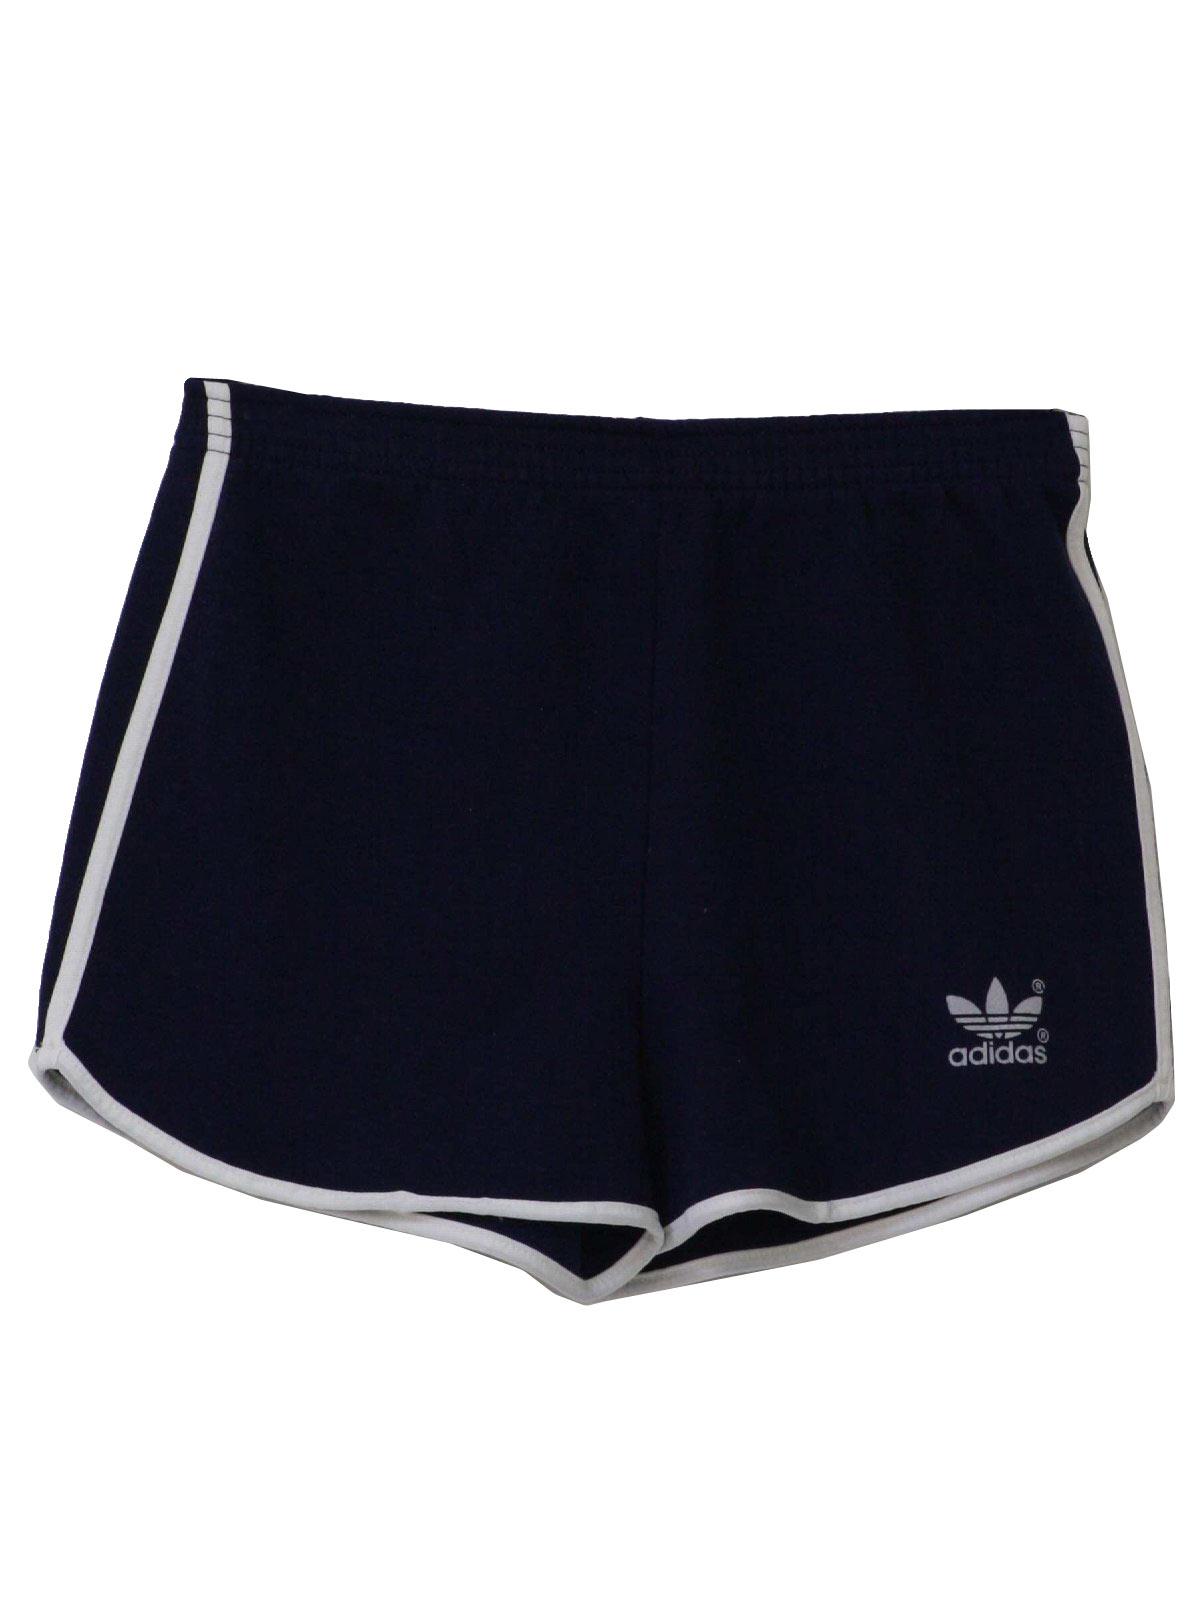 adidas shorts high waisted